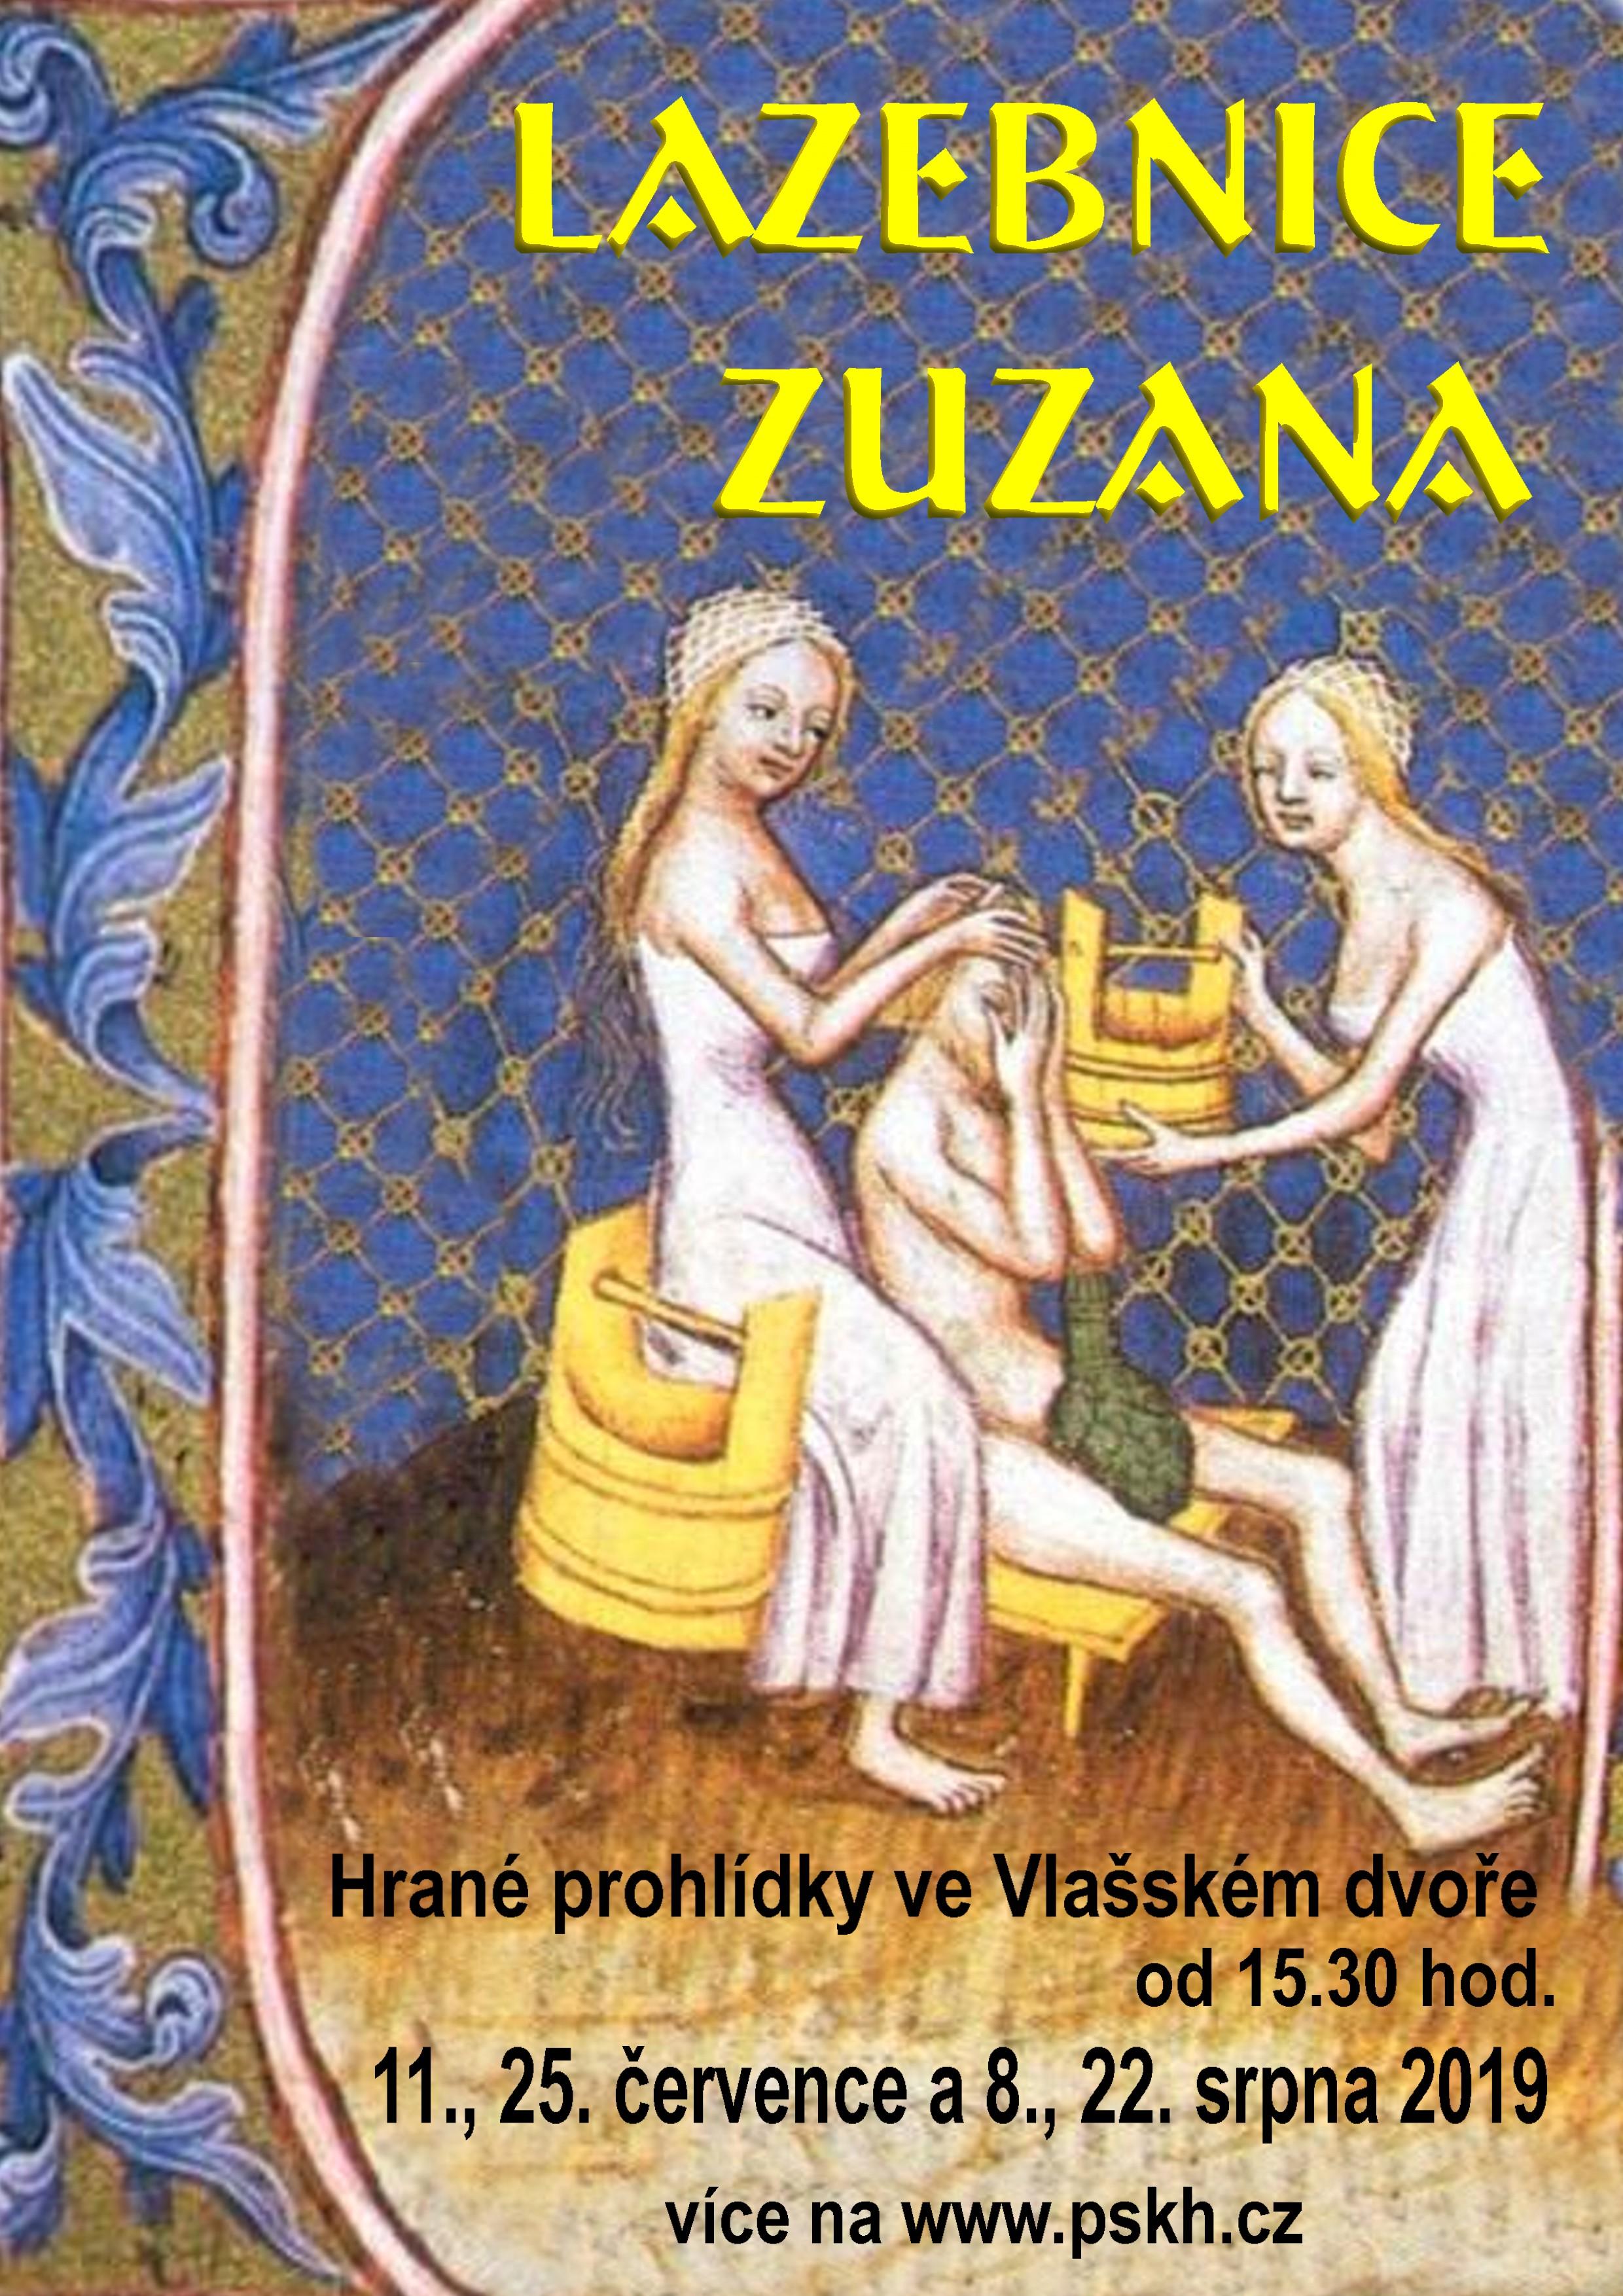 6396-lazebnice-zuzana-2019.jpg